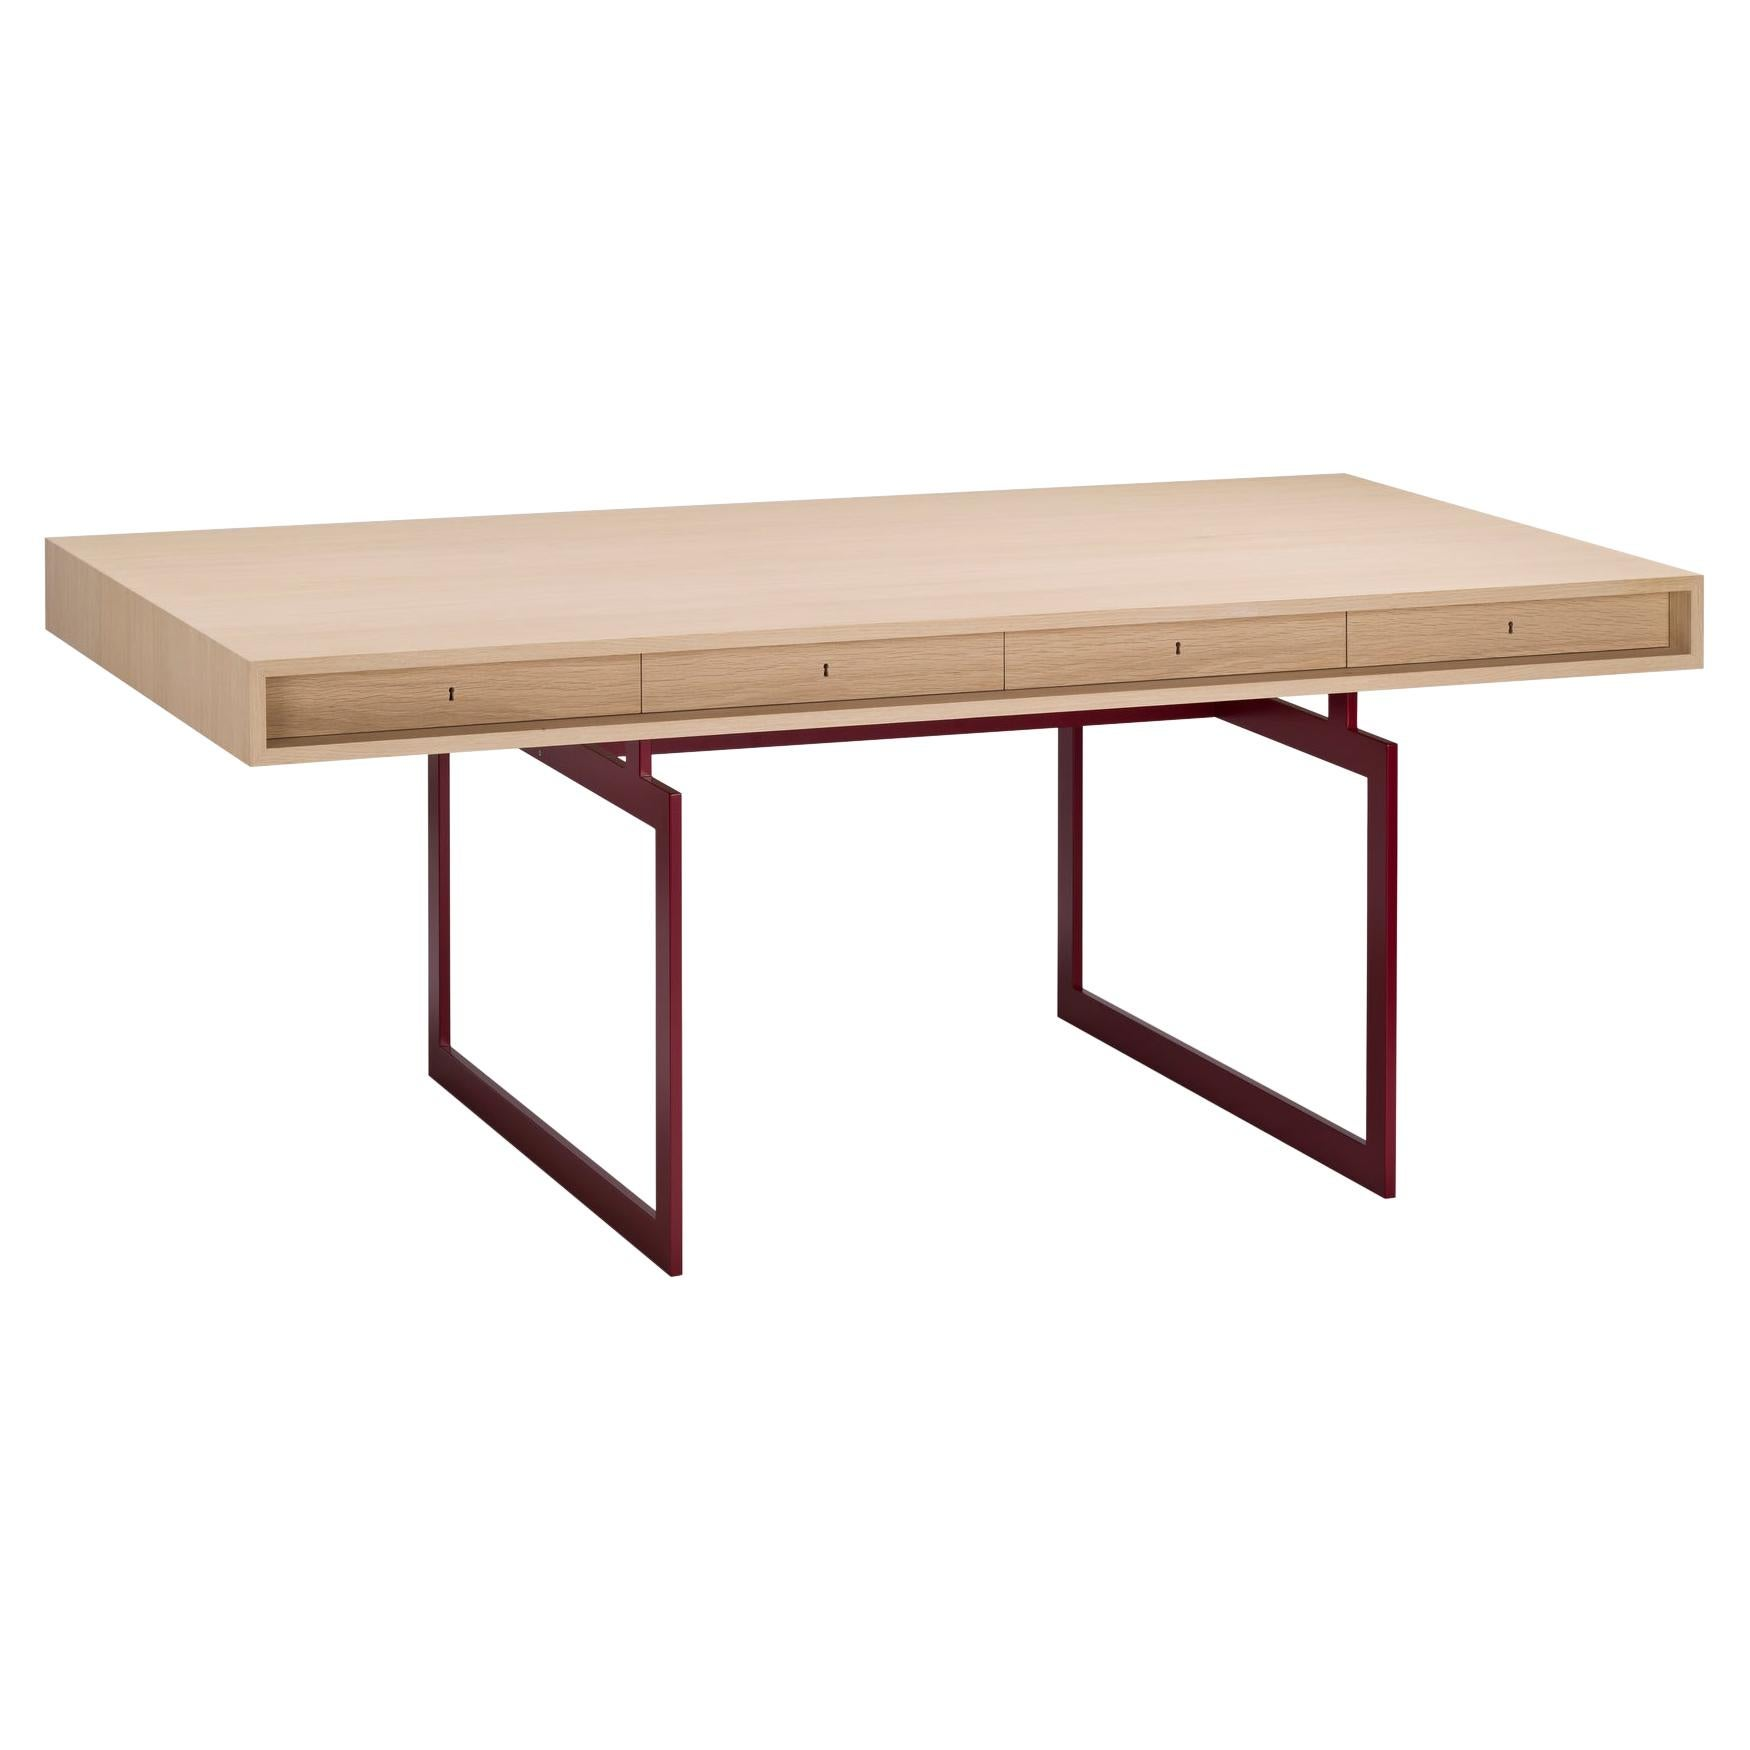 Bodil Kjær Office Desk Table, Wood and Steel by Karakter